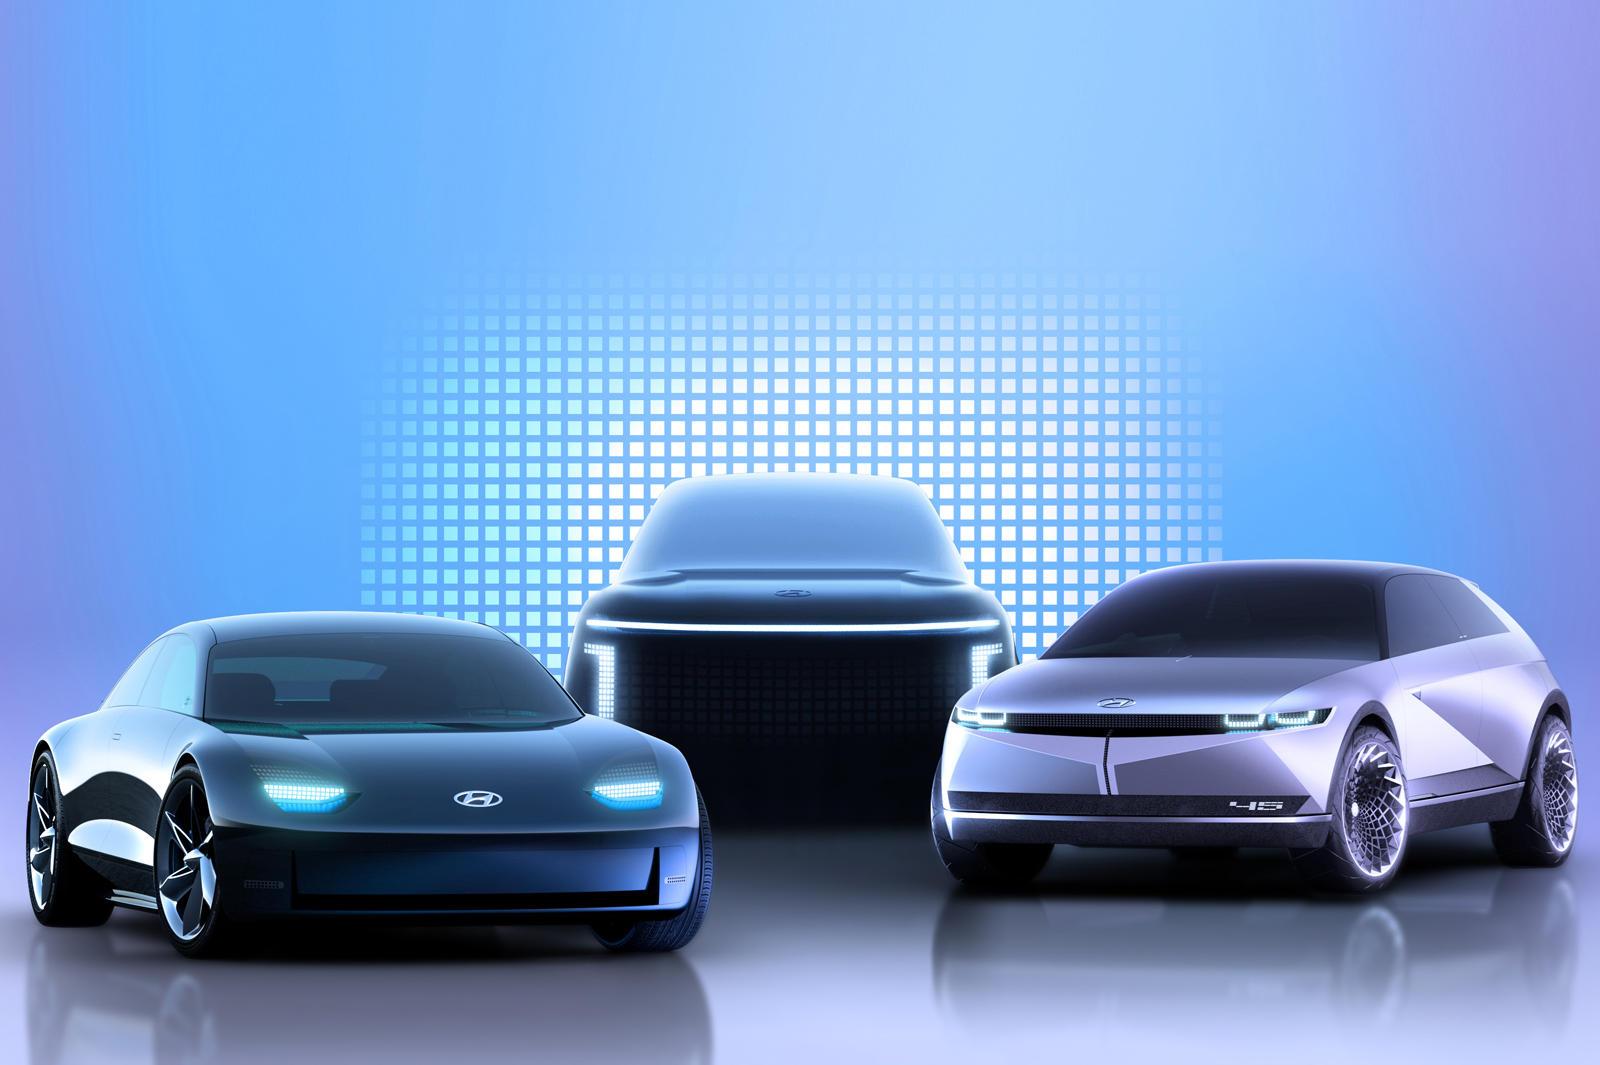 Official: Hyundai Launches New Ioniq All-Electric Brand